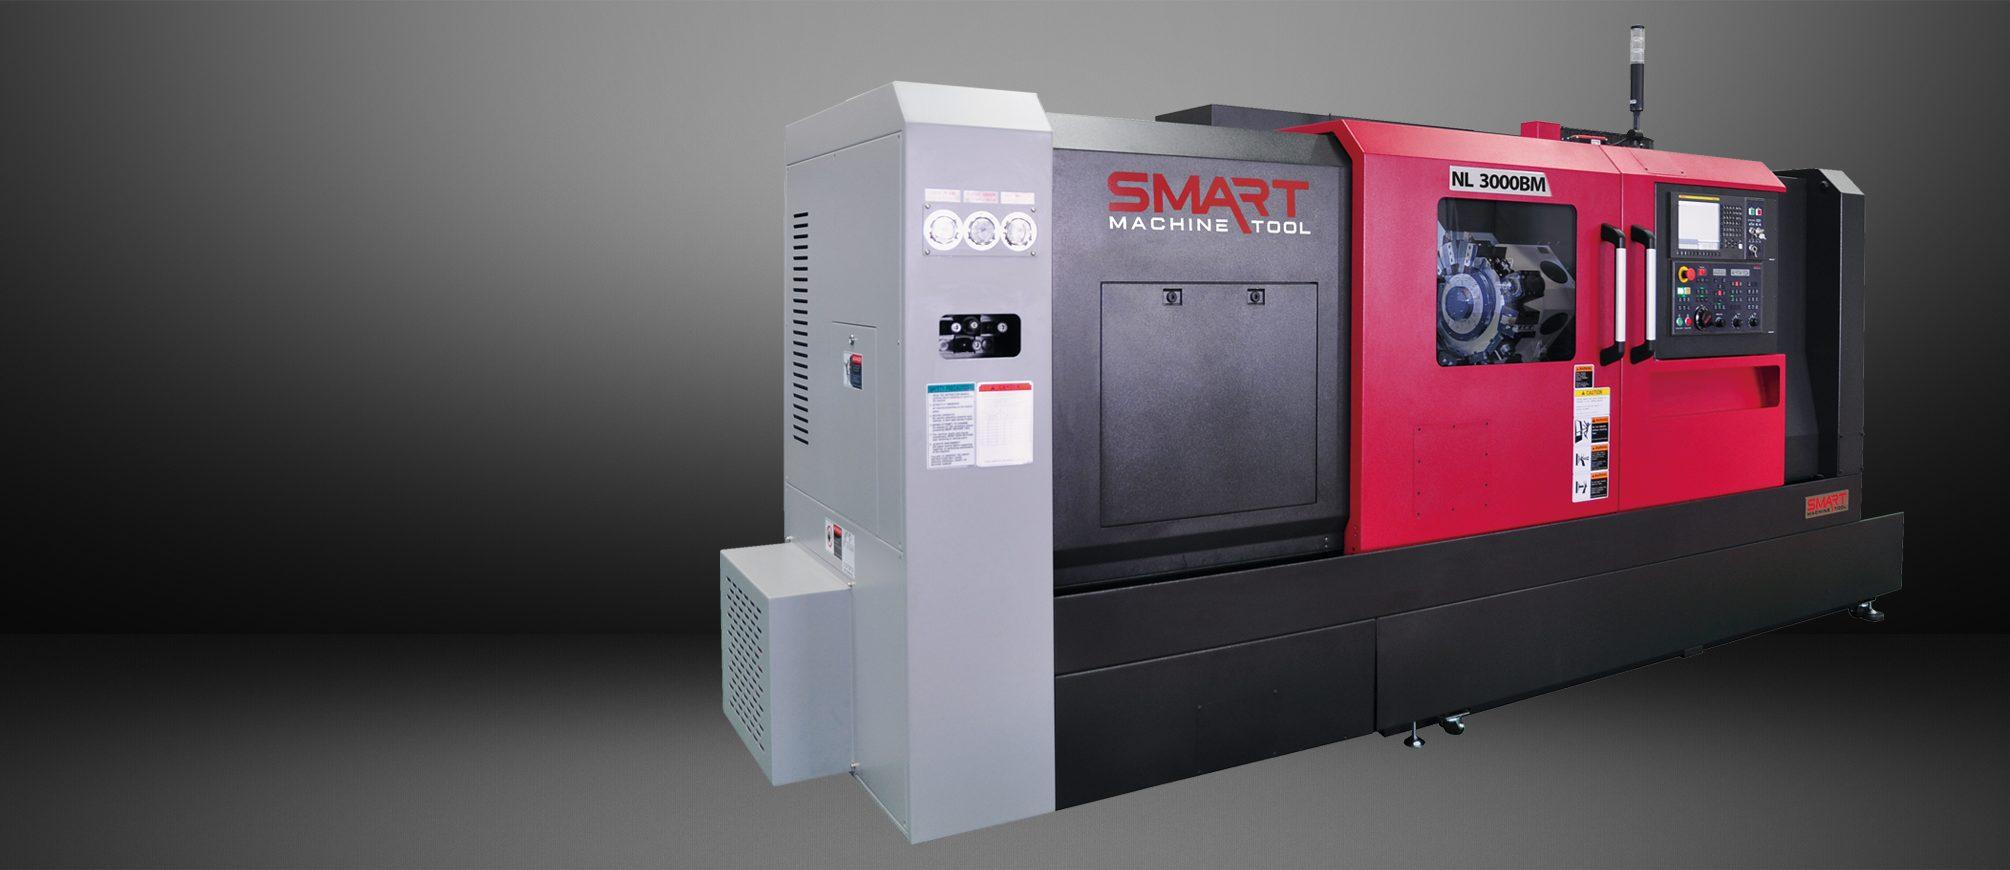 SMART NL 3000BM – BOX WAY – (12″ CHUCK) 3-Axis CNC Lathes